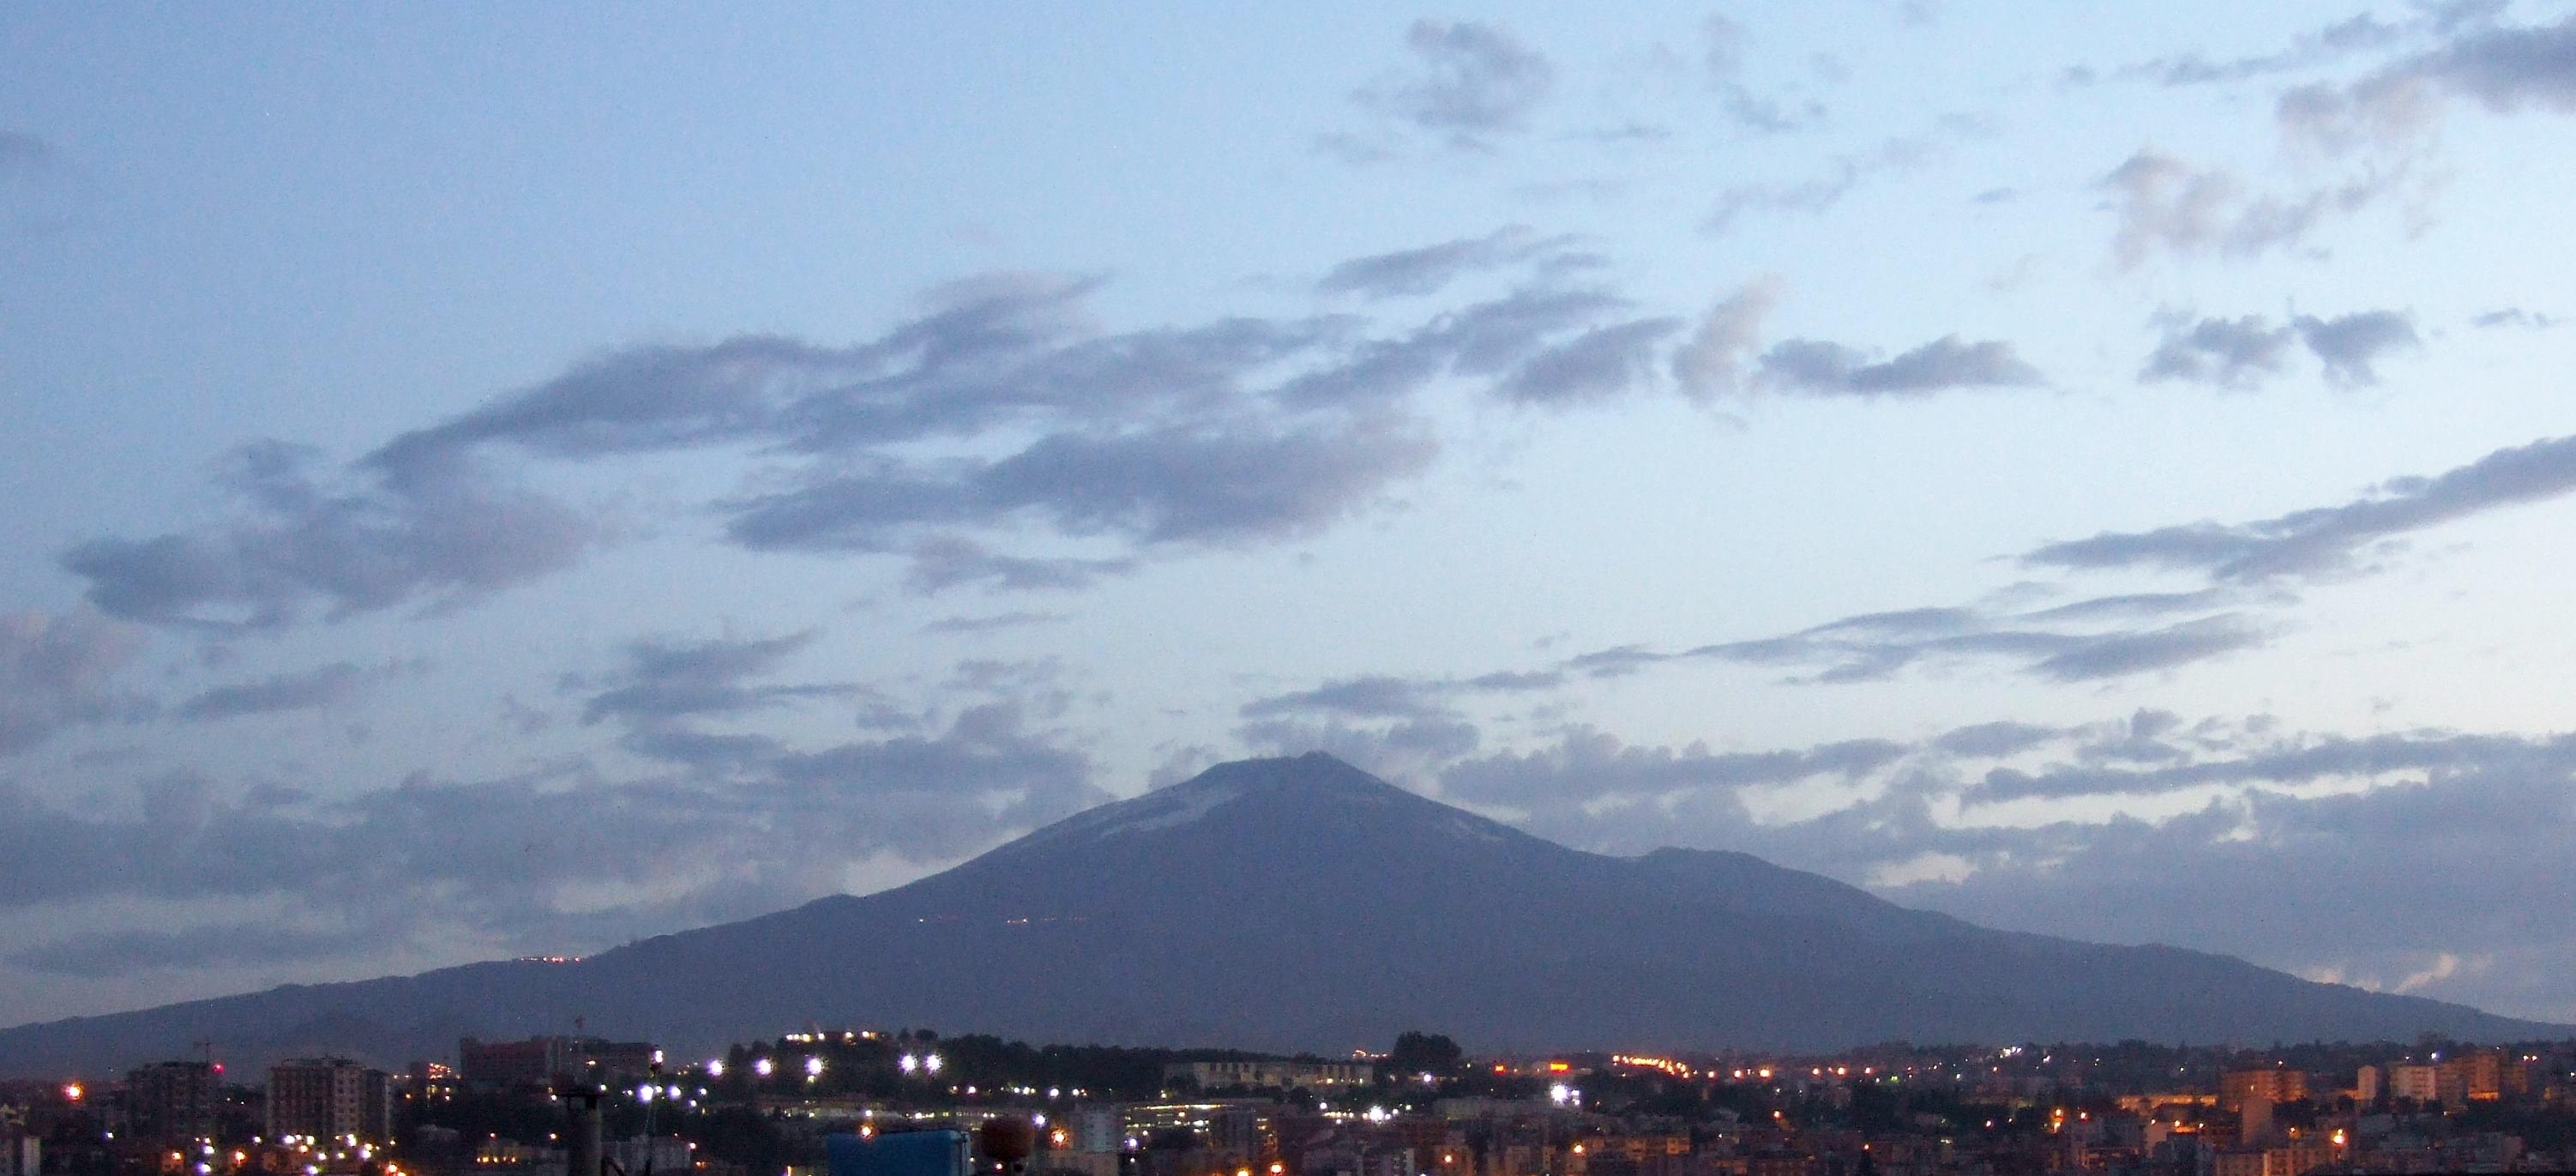 Etna at Dawn - Catania - Italy - Etna Volcano - Creative Commons by gnuckx, Photos, Photo, Panoramio, Pic, HQ Photo